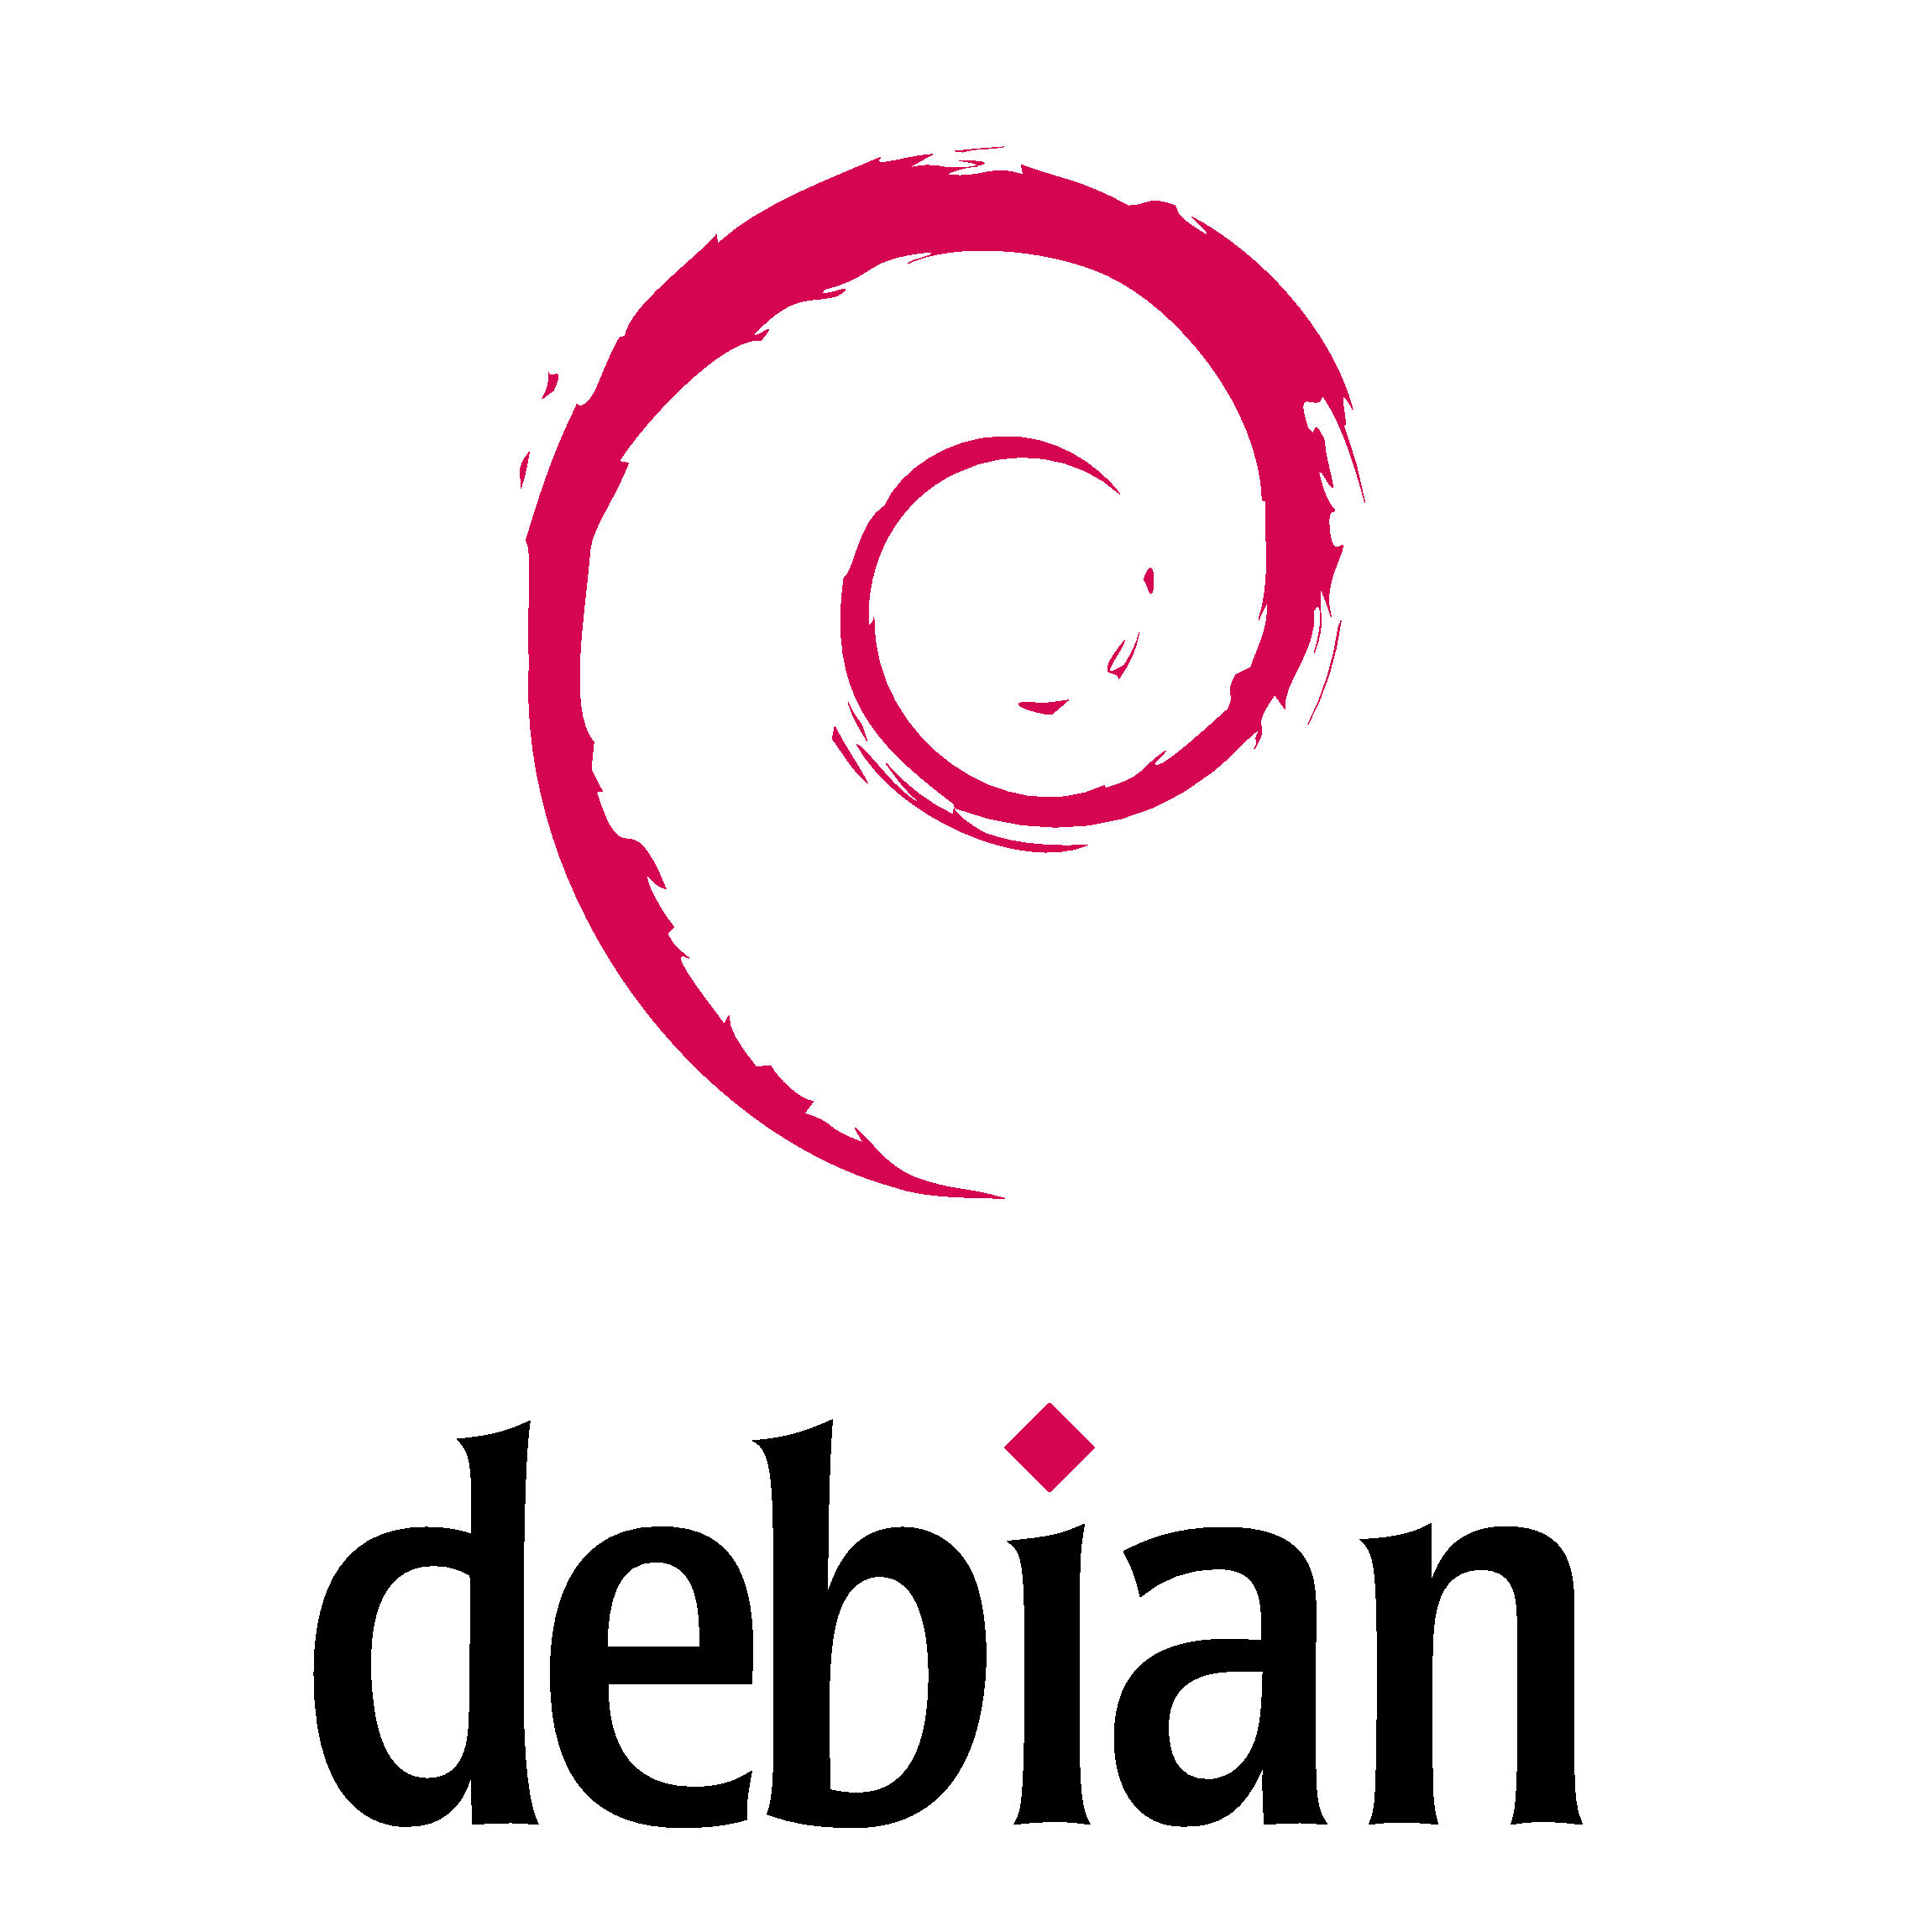 kisspng-debian-logo-linux-ubuntu-fedora-kronometrix-download-5b6ddaedeeae70.4298484215339261259777